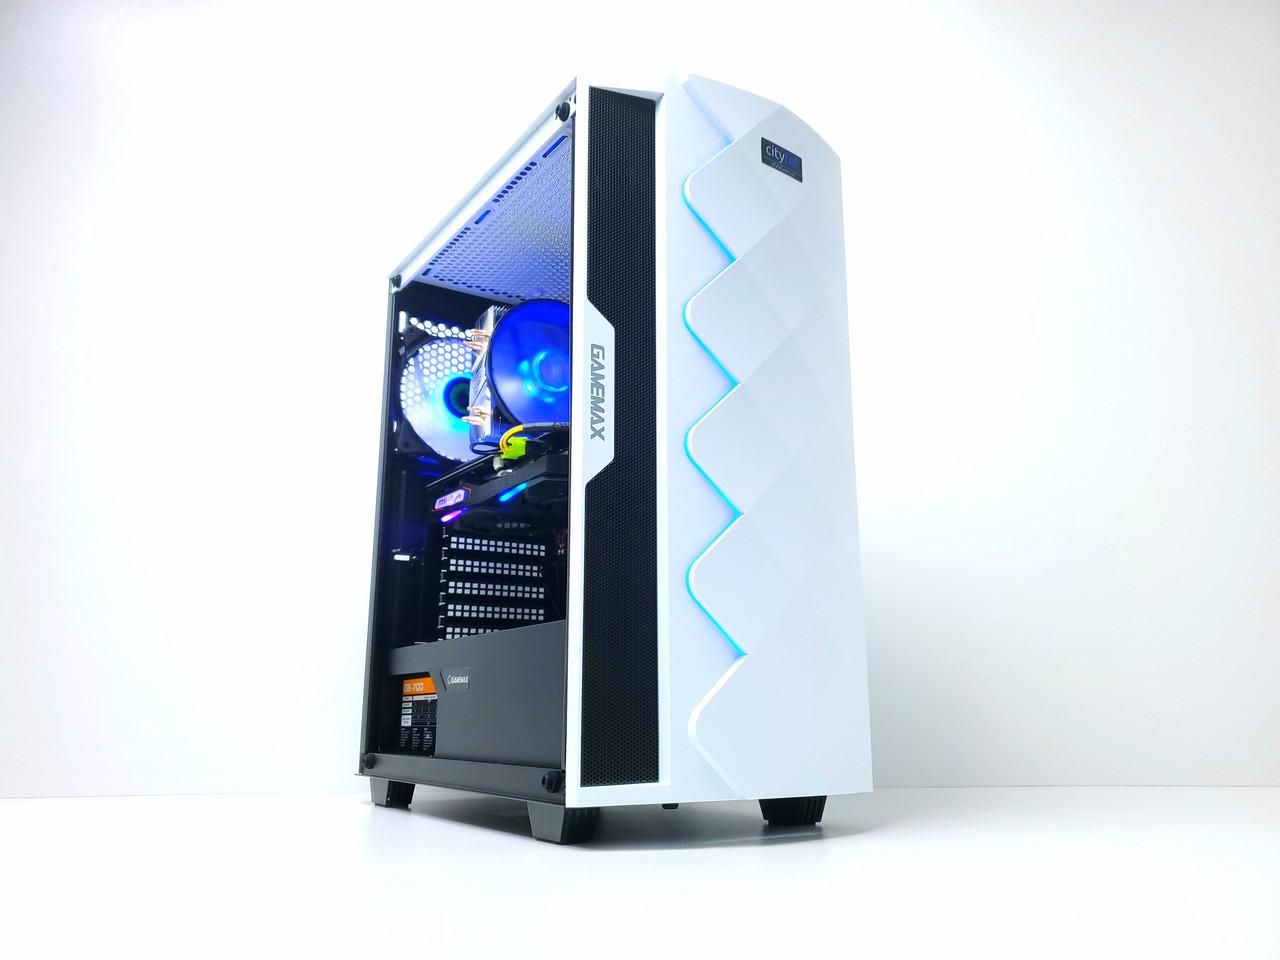 Ігровий Комп'ютер Core i5-10400F (6 ядер) 16GB DDR4 SSD240GB+HDD1000GB Sapphire Radeon RX 580 Nitro+ 4GB GDDR5